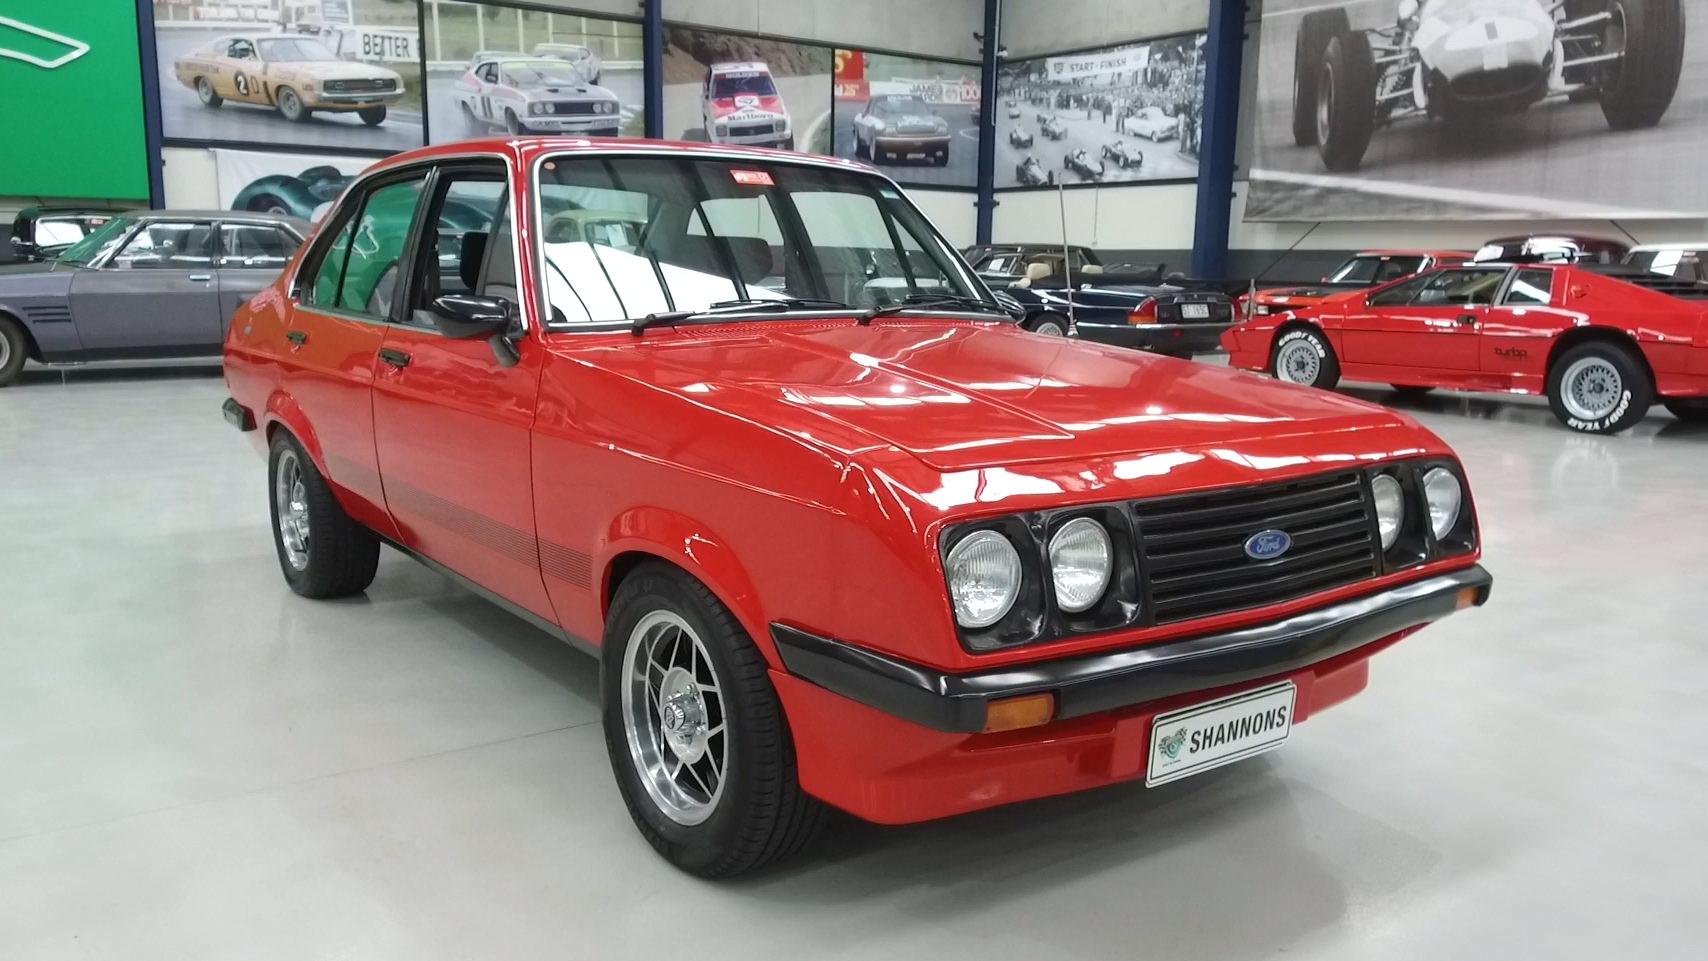 1980 Ford Escort RS2000 Sedan - 2021 Shannons Winter Timed Online Auction